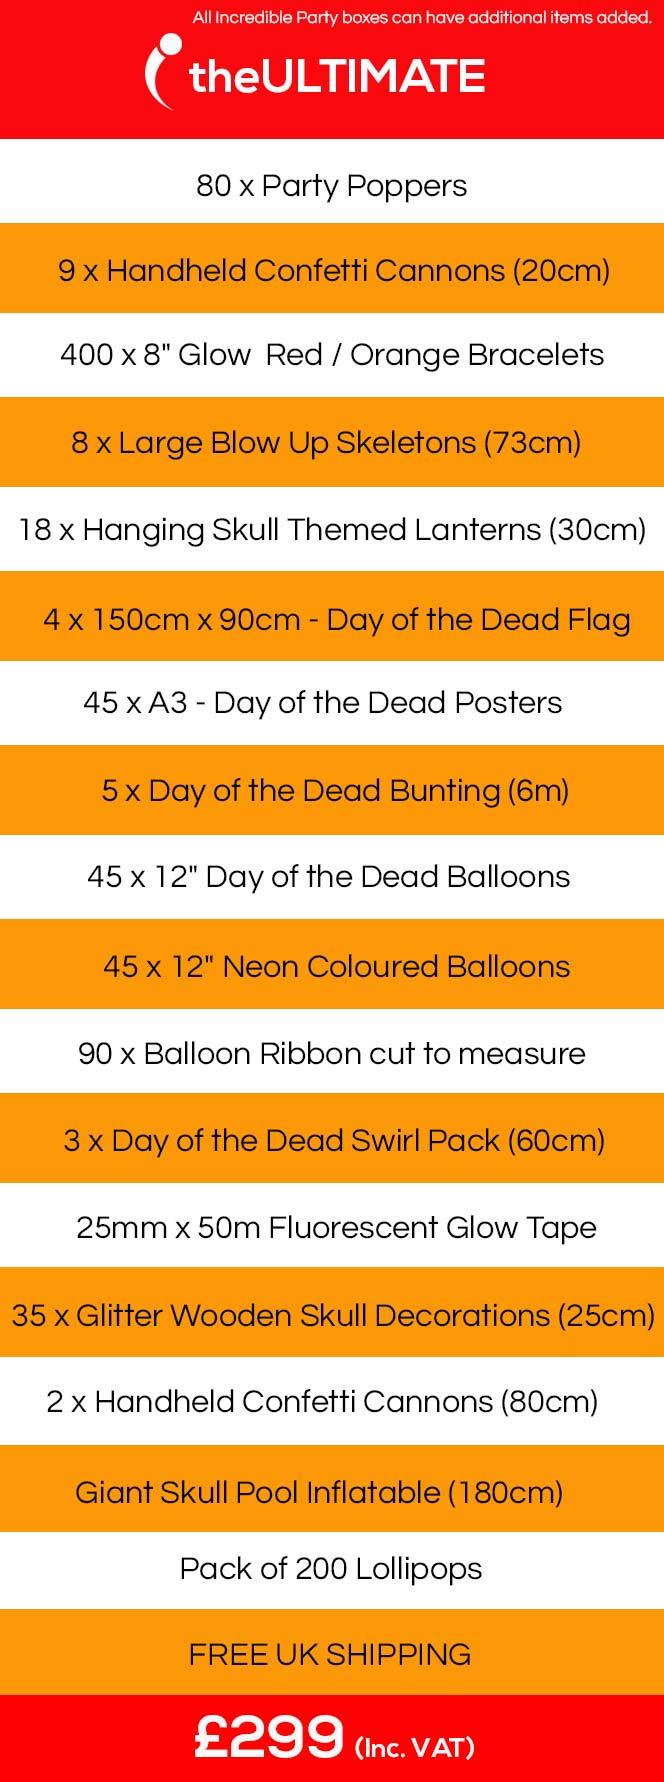 Day of the Dead Theme, Halloween, Día de los Muertos, Day of the dead Party